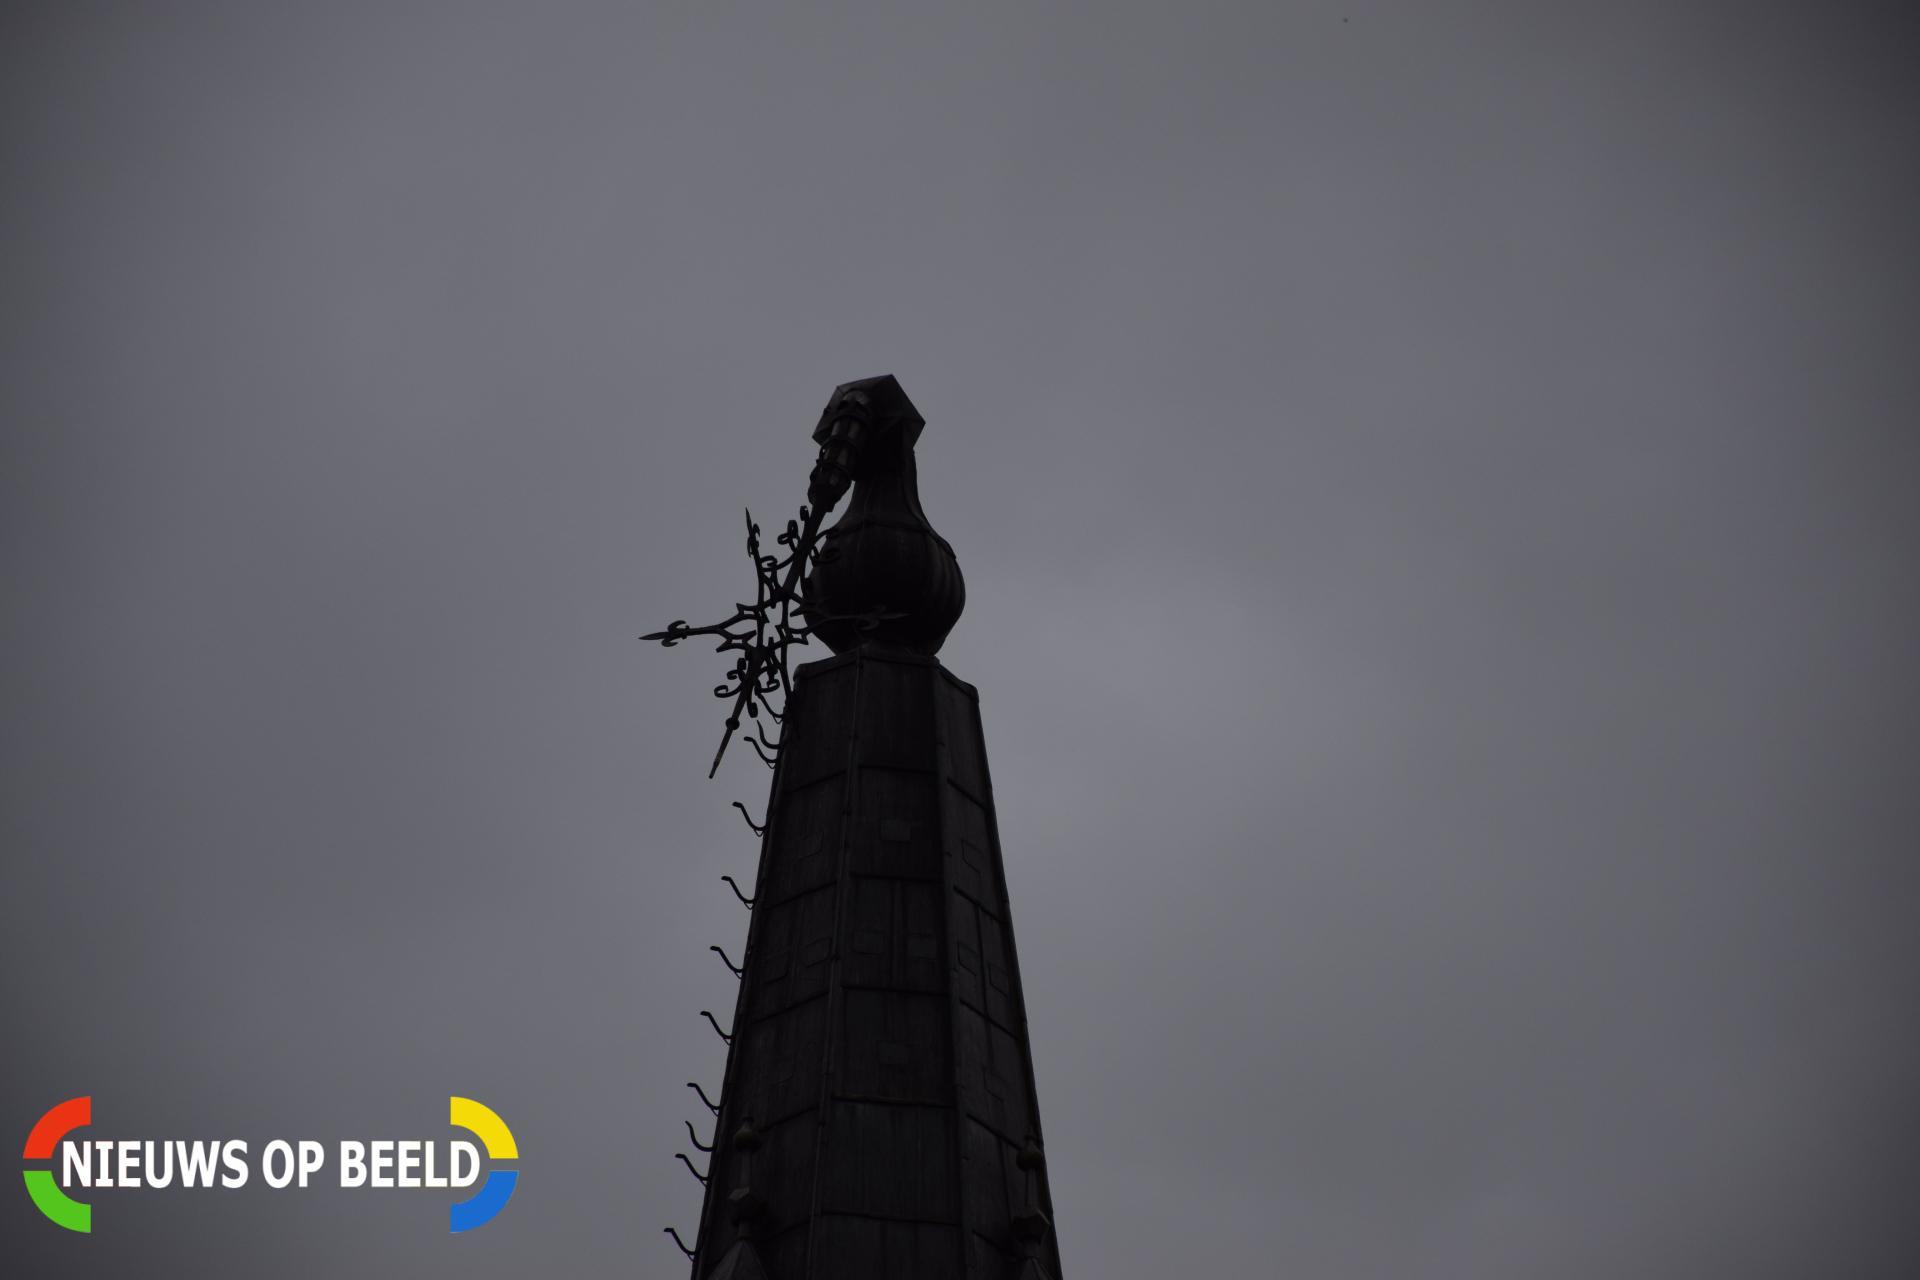 Torenspits Dorpskerk zwaar beschadigd Kerkplein Moordrecht